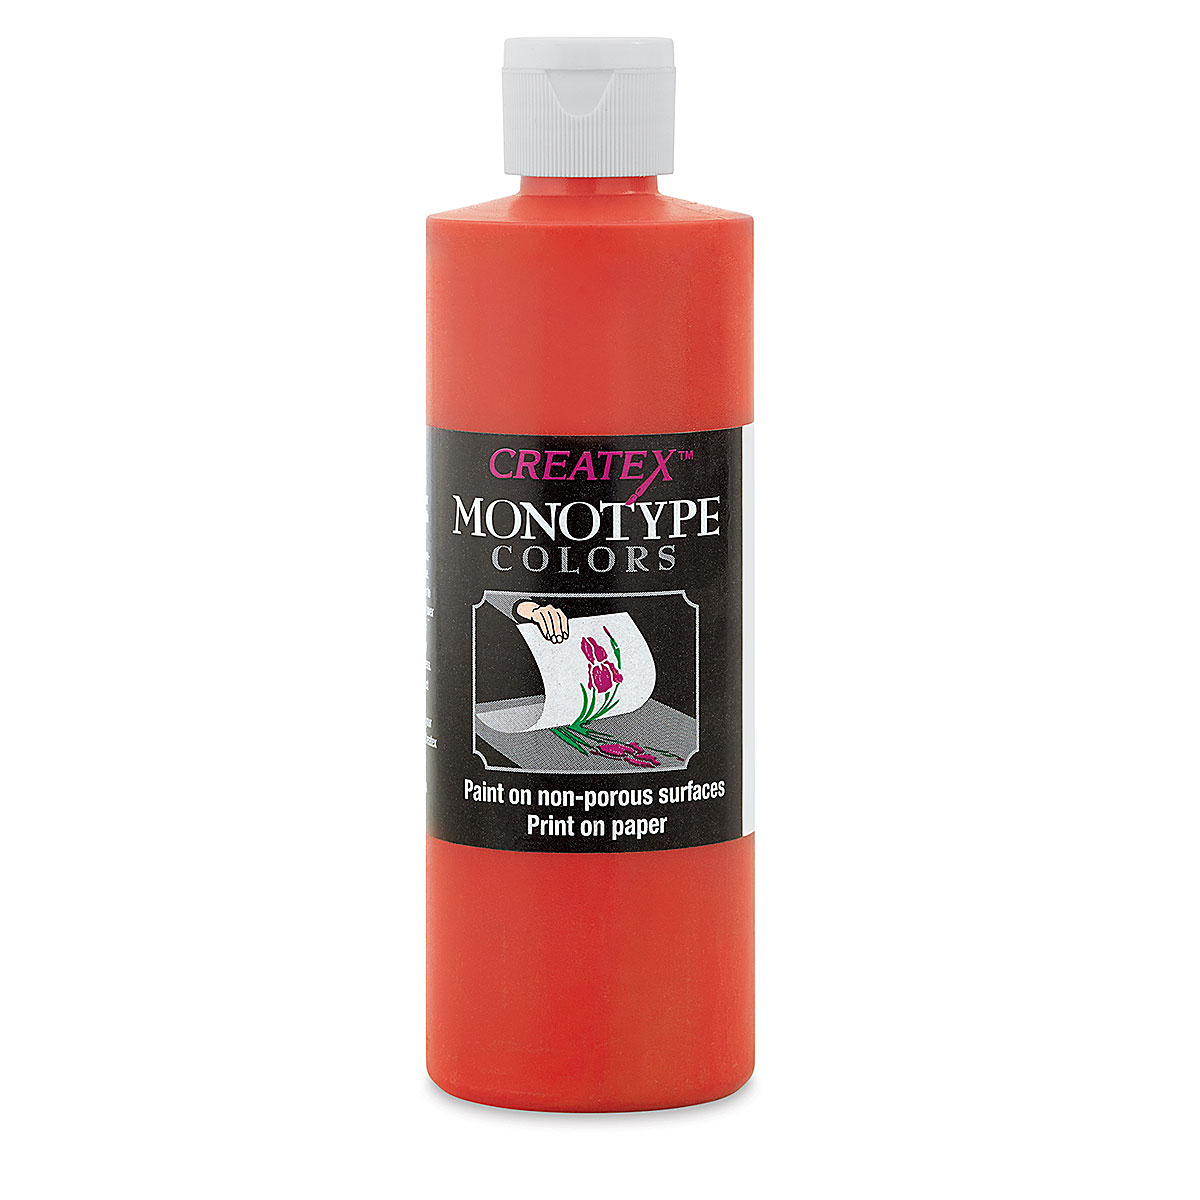 Createx Monotype Colors - Scarlet, 8 oz bottle